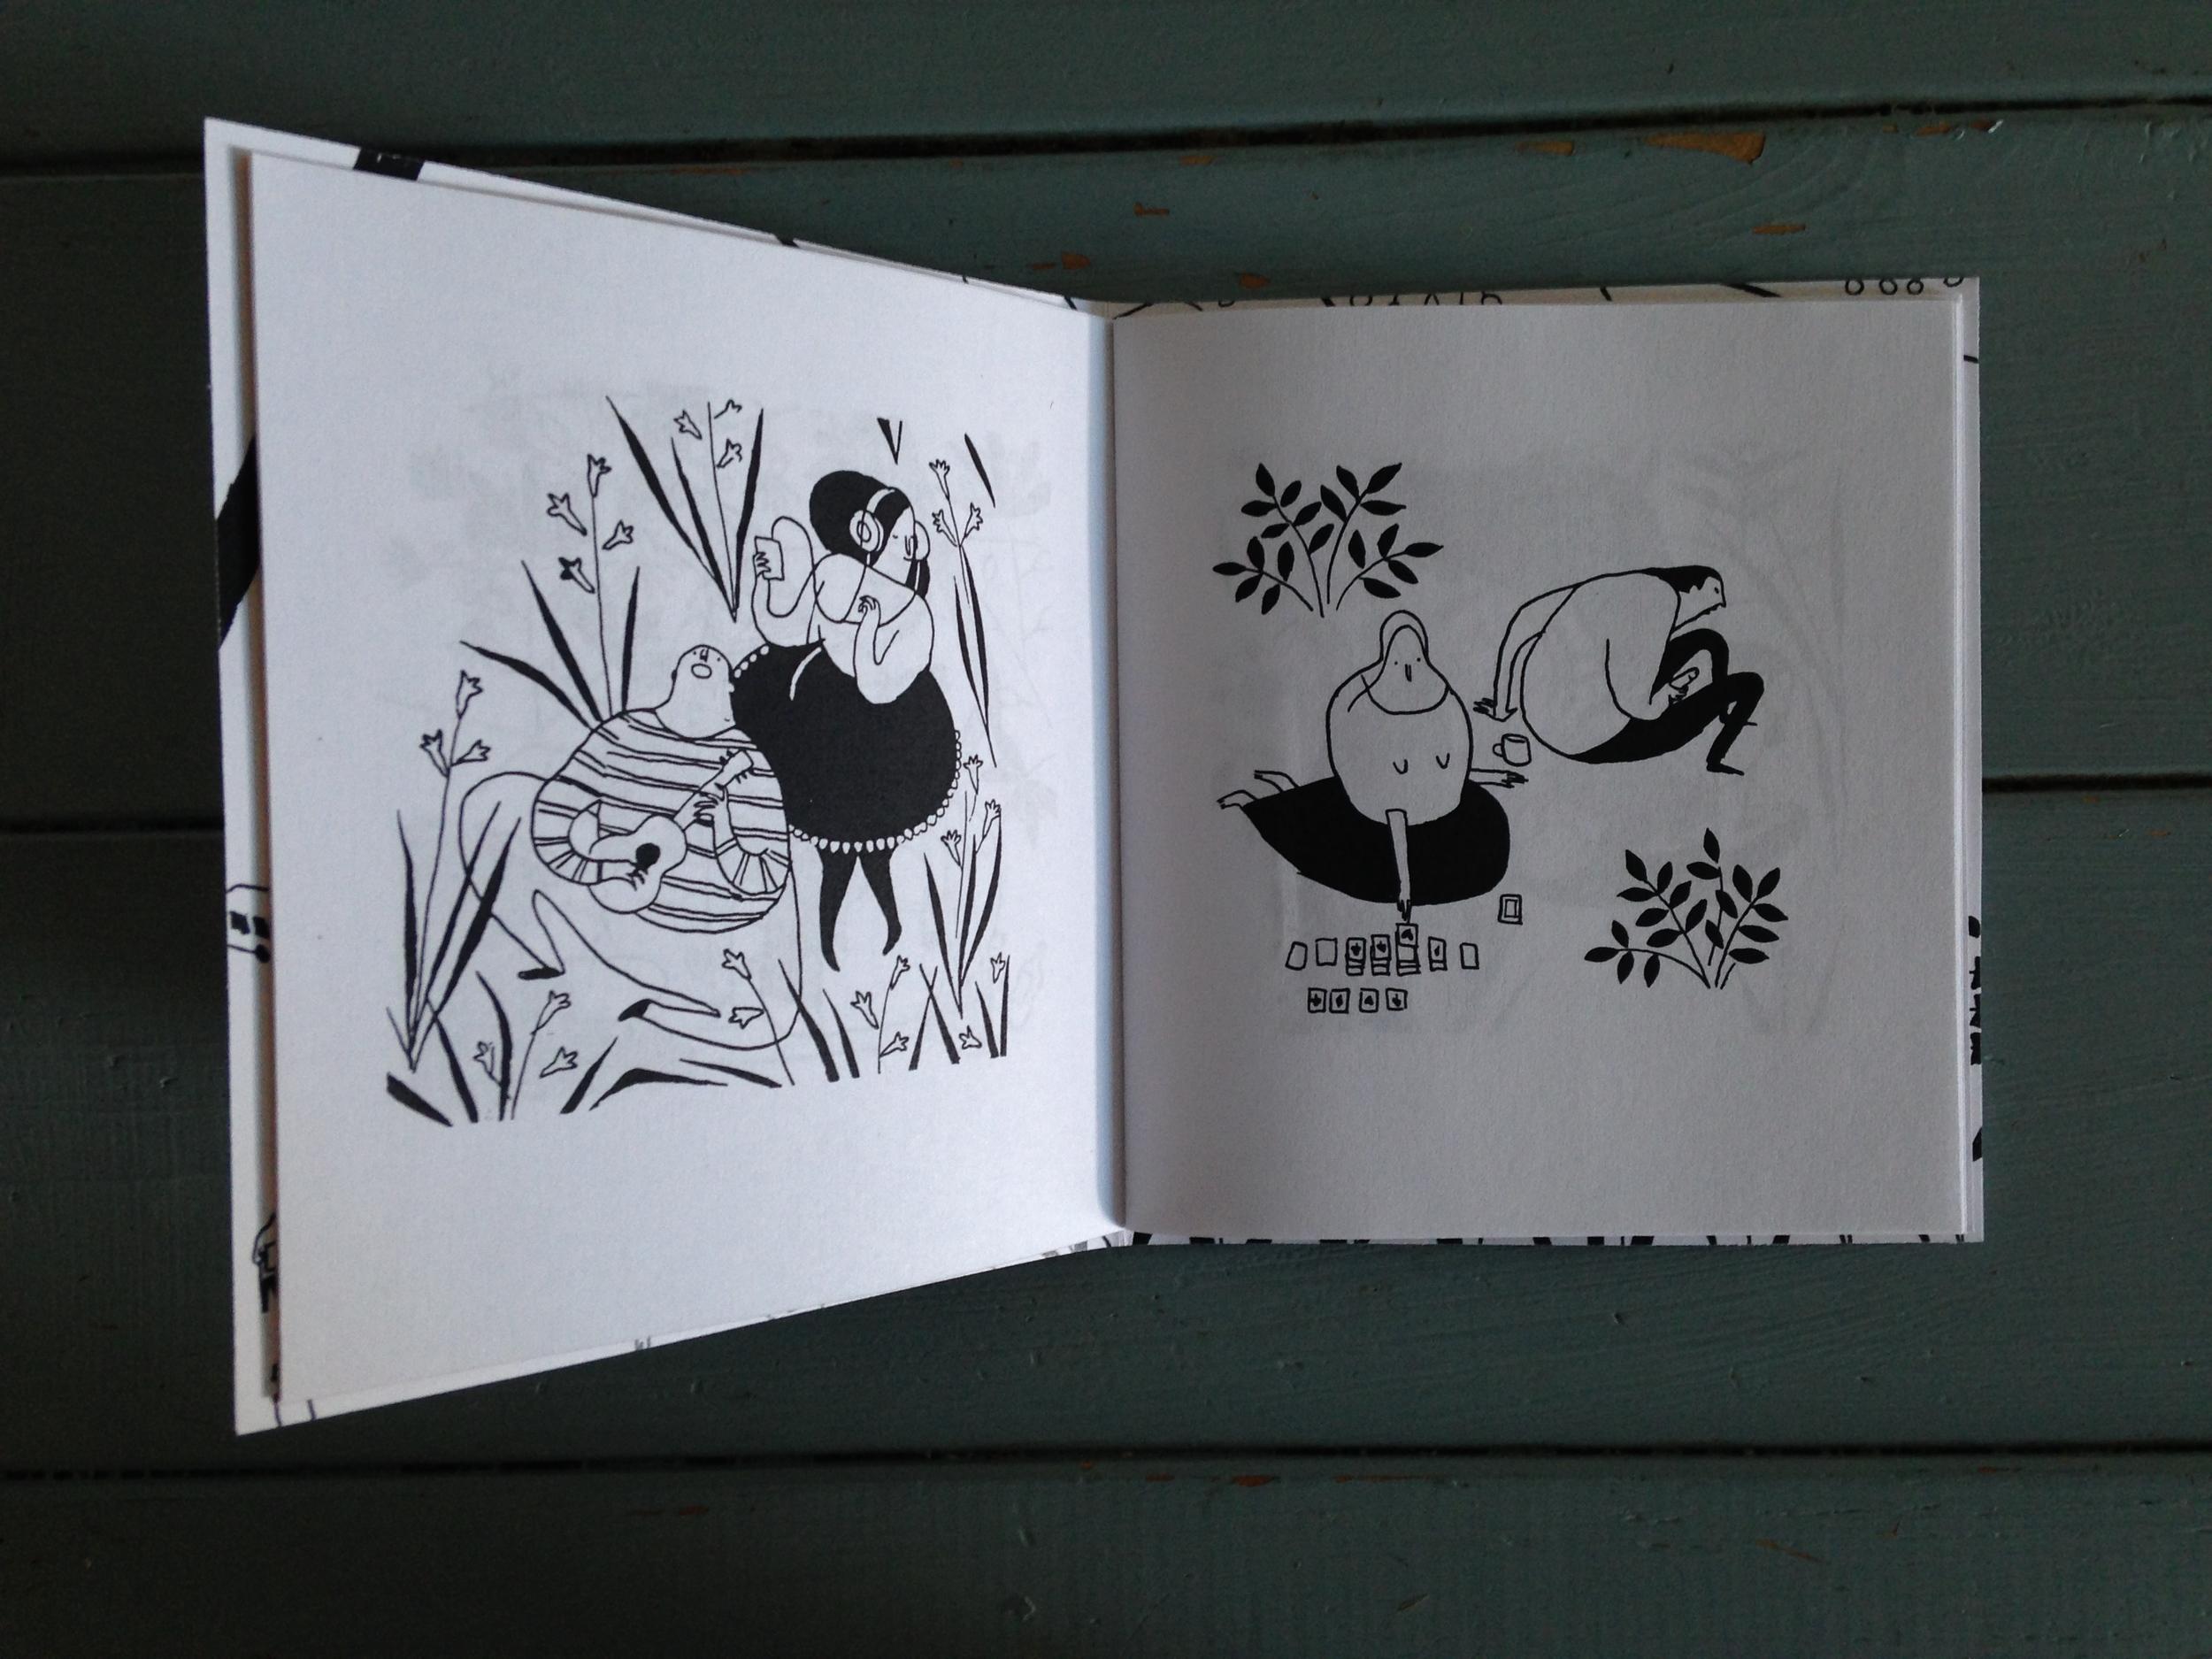 Eleanor_Davis_31_drawings_book.jpg